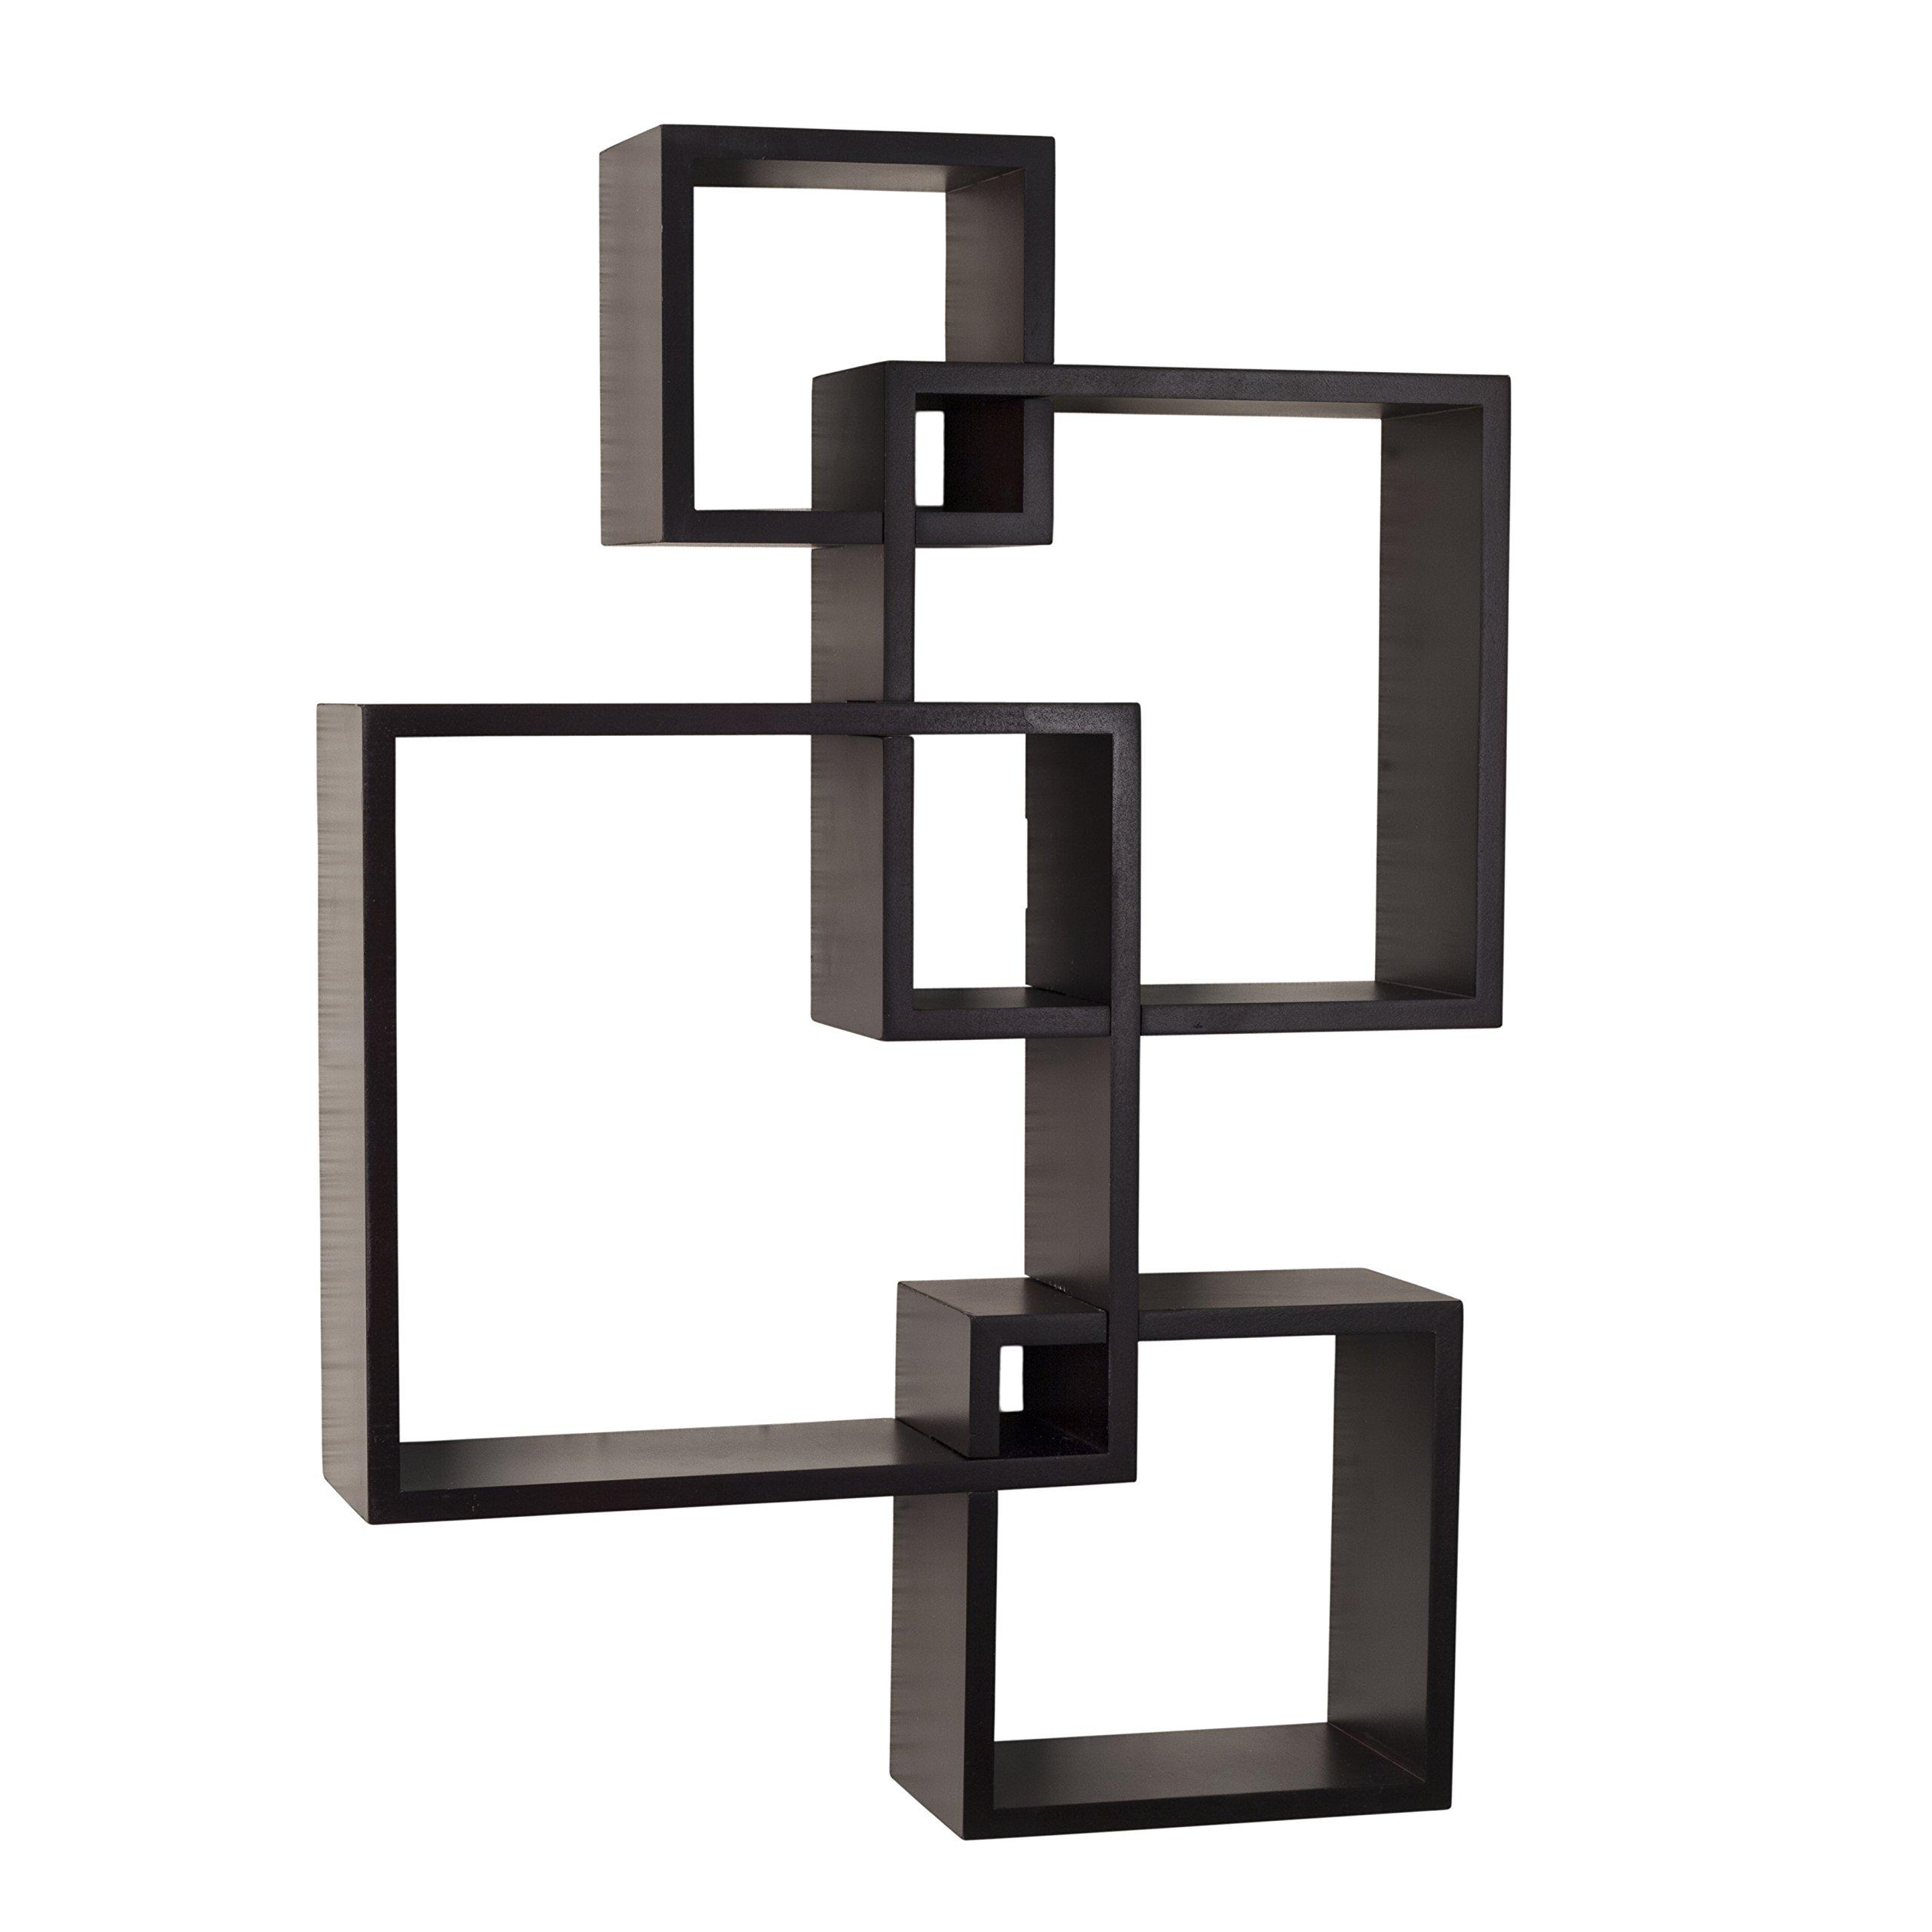 Danya B. BR1023ES Decorative Wall Mount Floating Intersecting Cube Accent Wall Shelf - Espresso